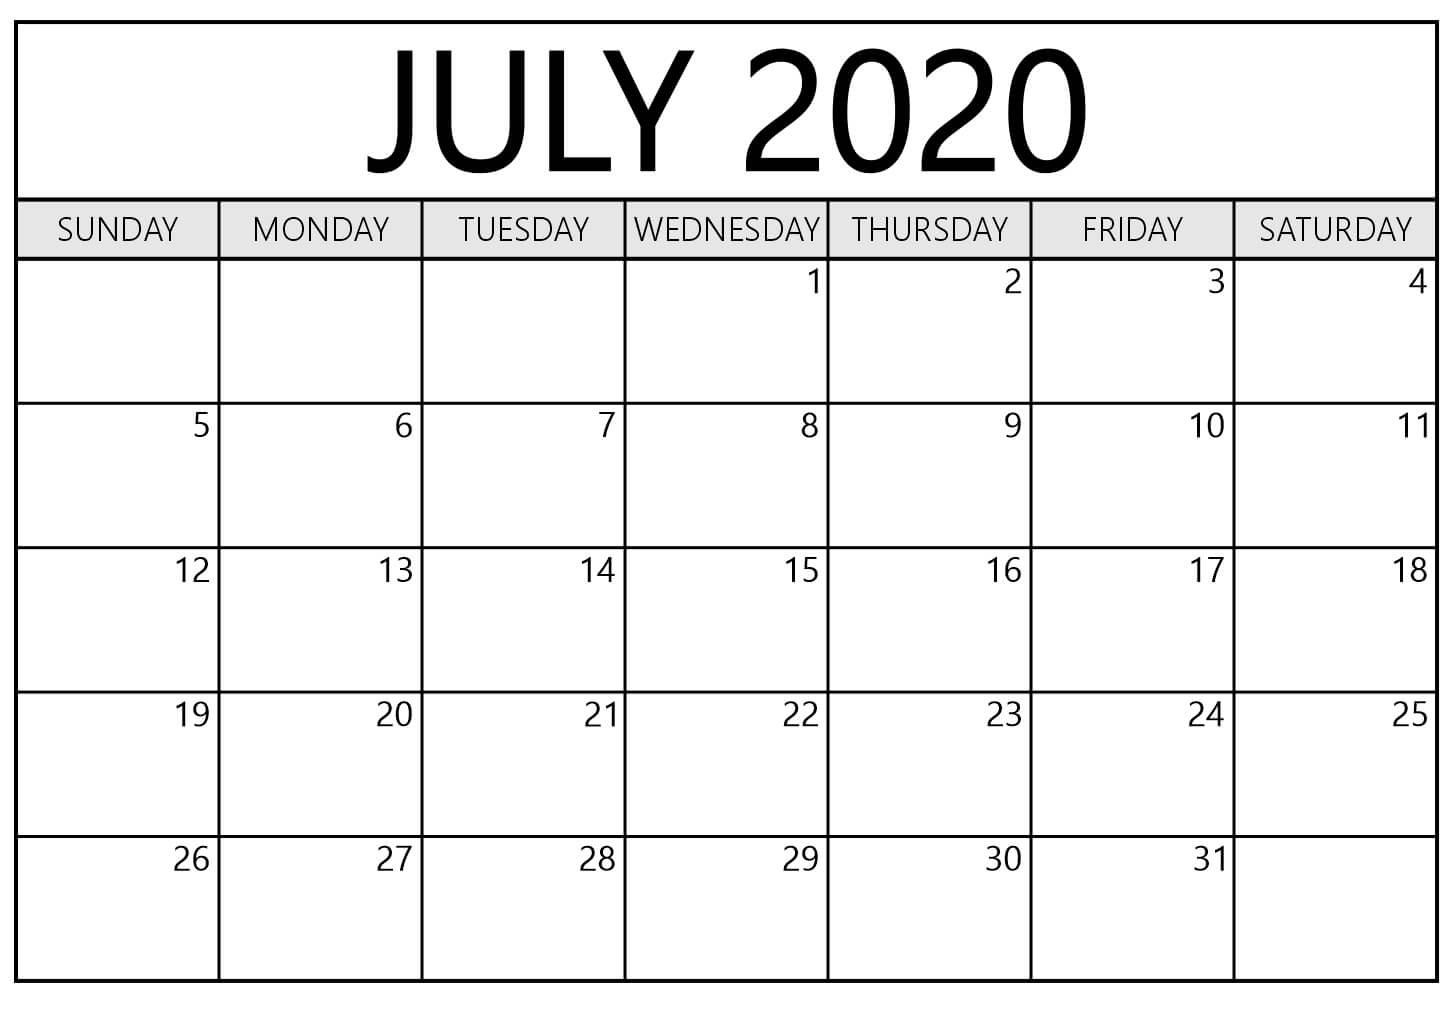 Calendar July 2020